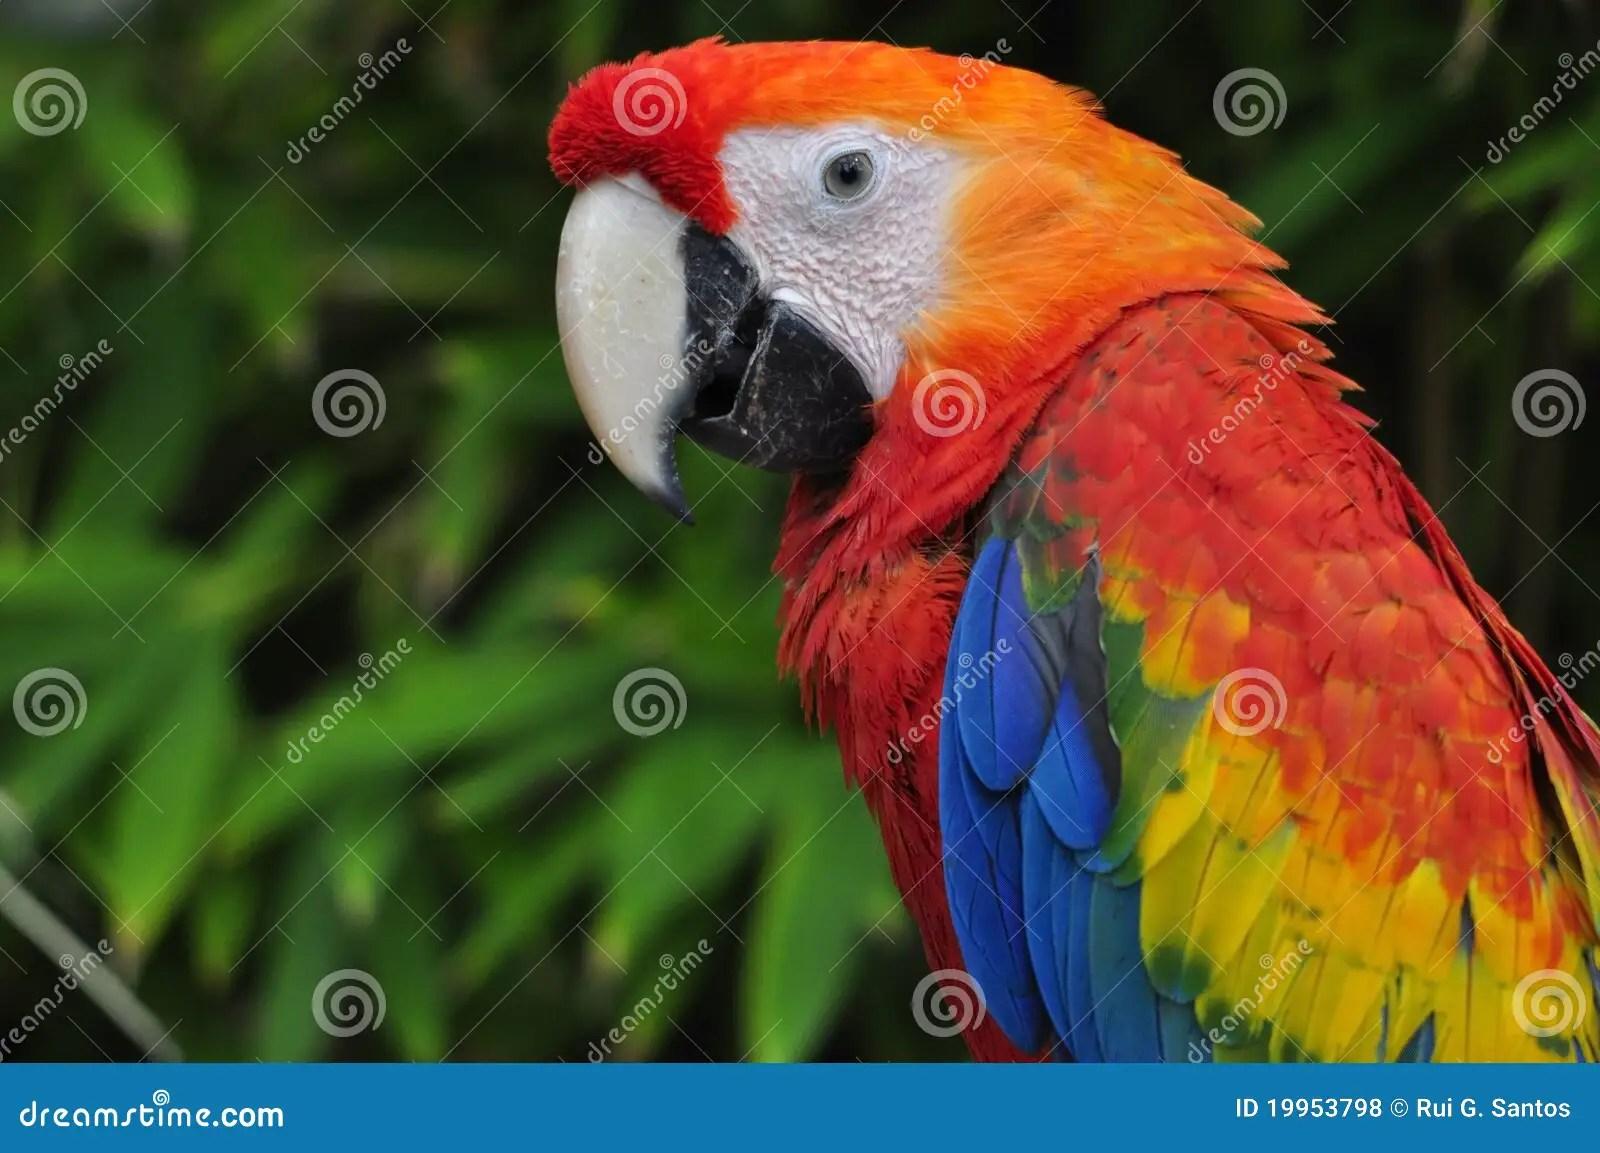 Red Animal Print Wallpaper Red Parrot Stock Photo Image Of Parrot Animal Bird